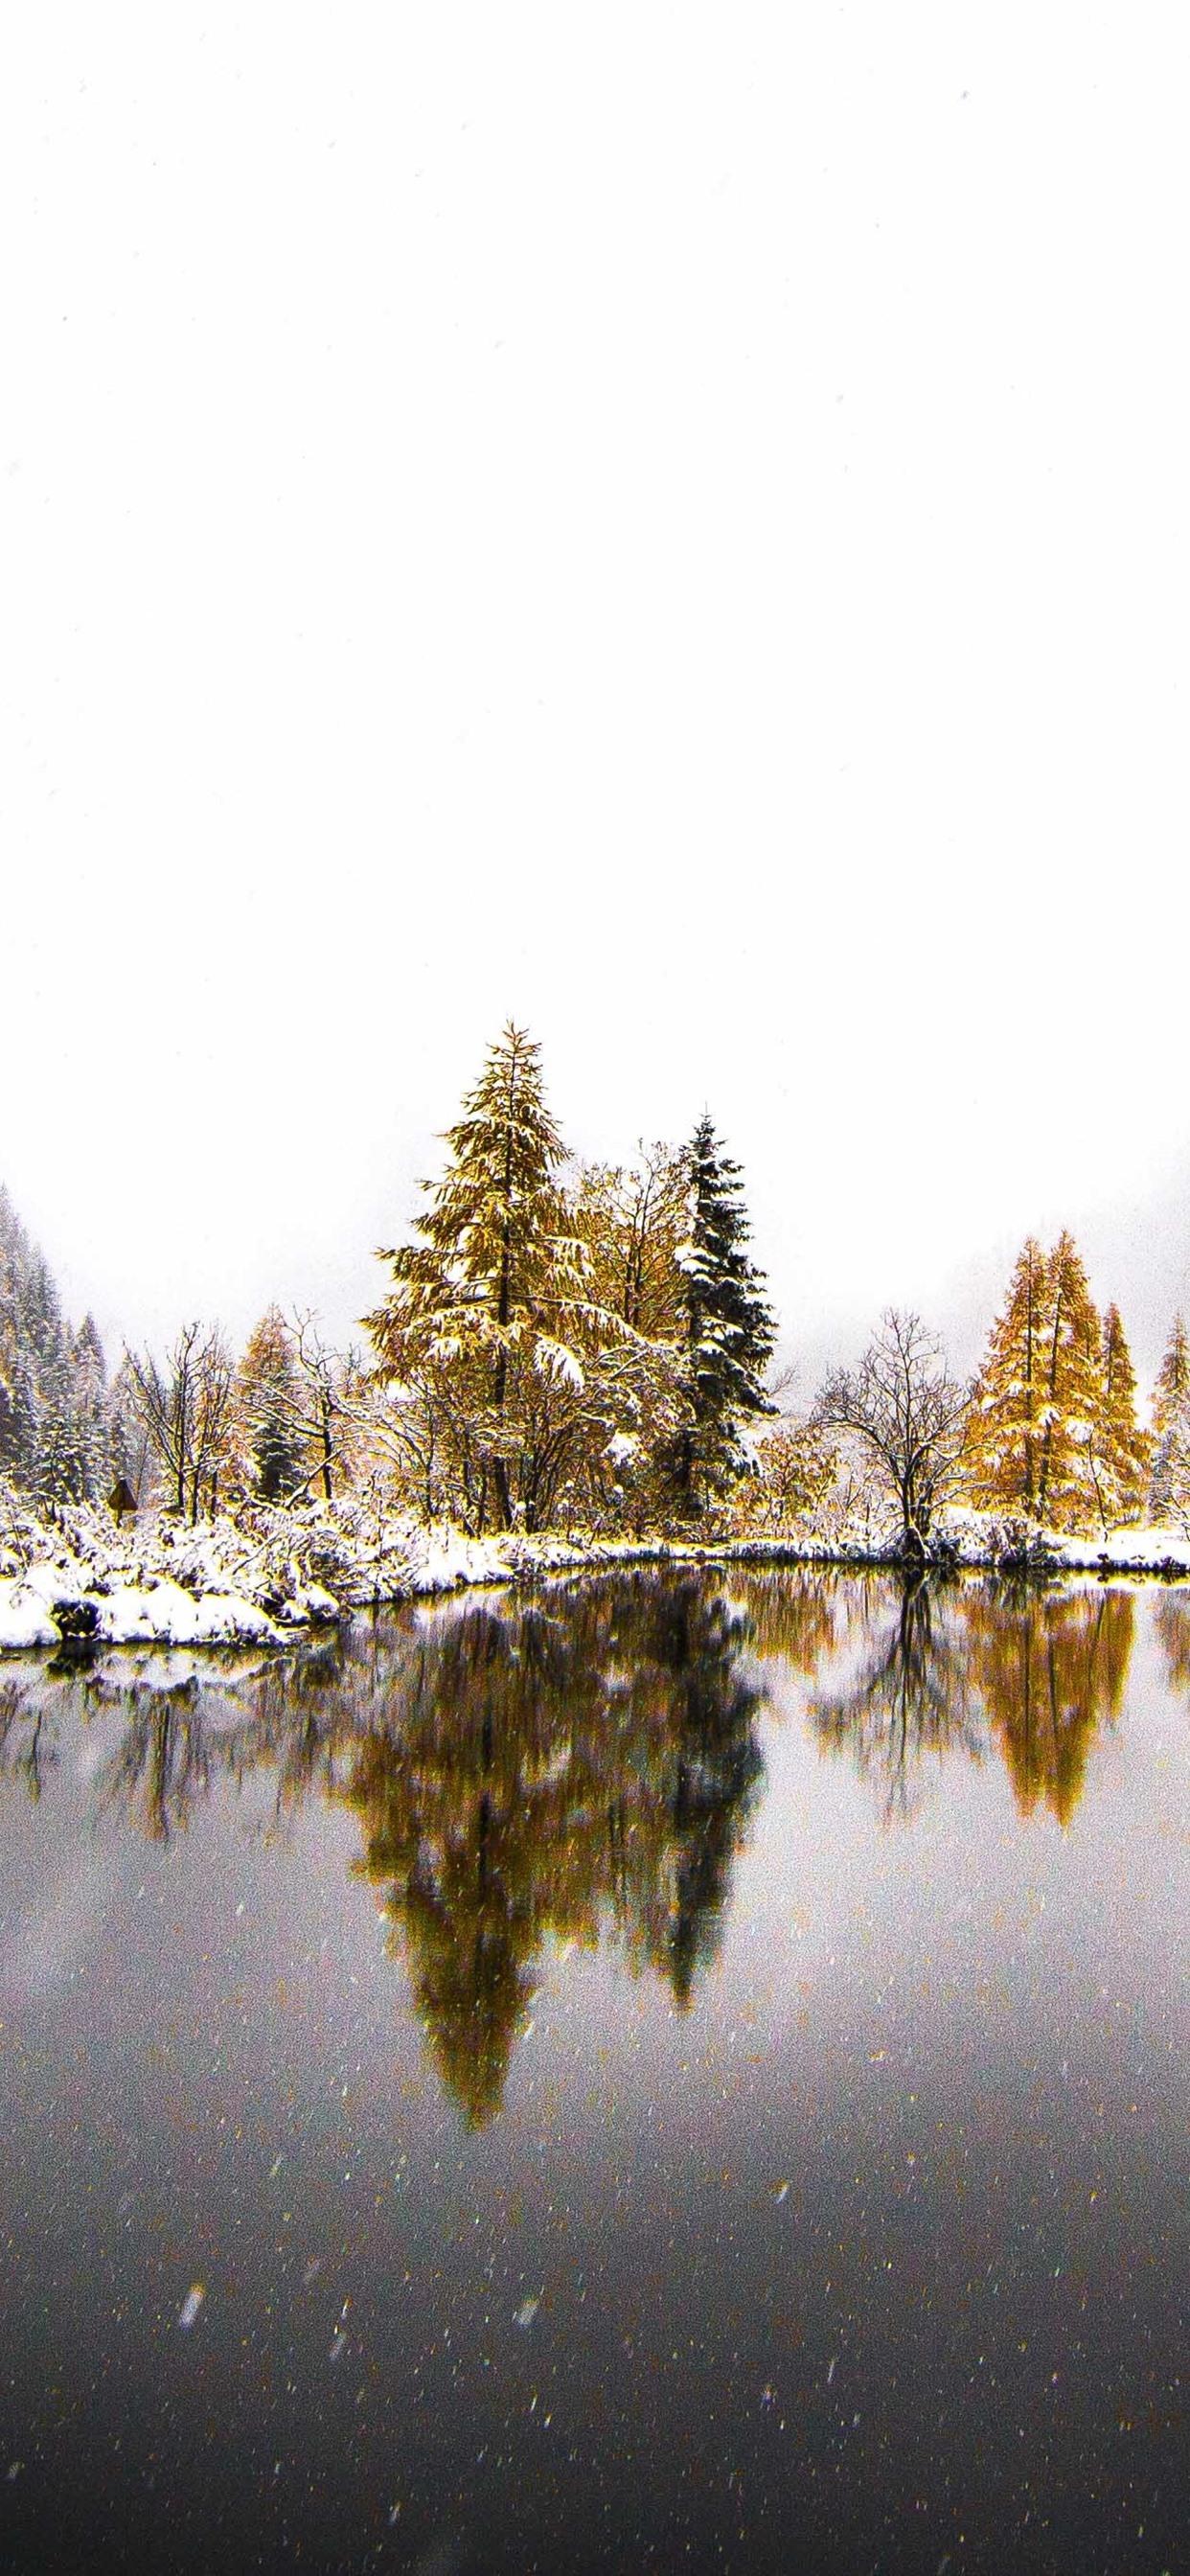 Mountains Trees Lake Snow Winter Fog 1242x2688 Iphone